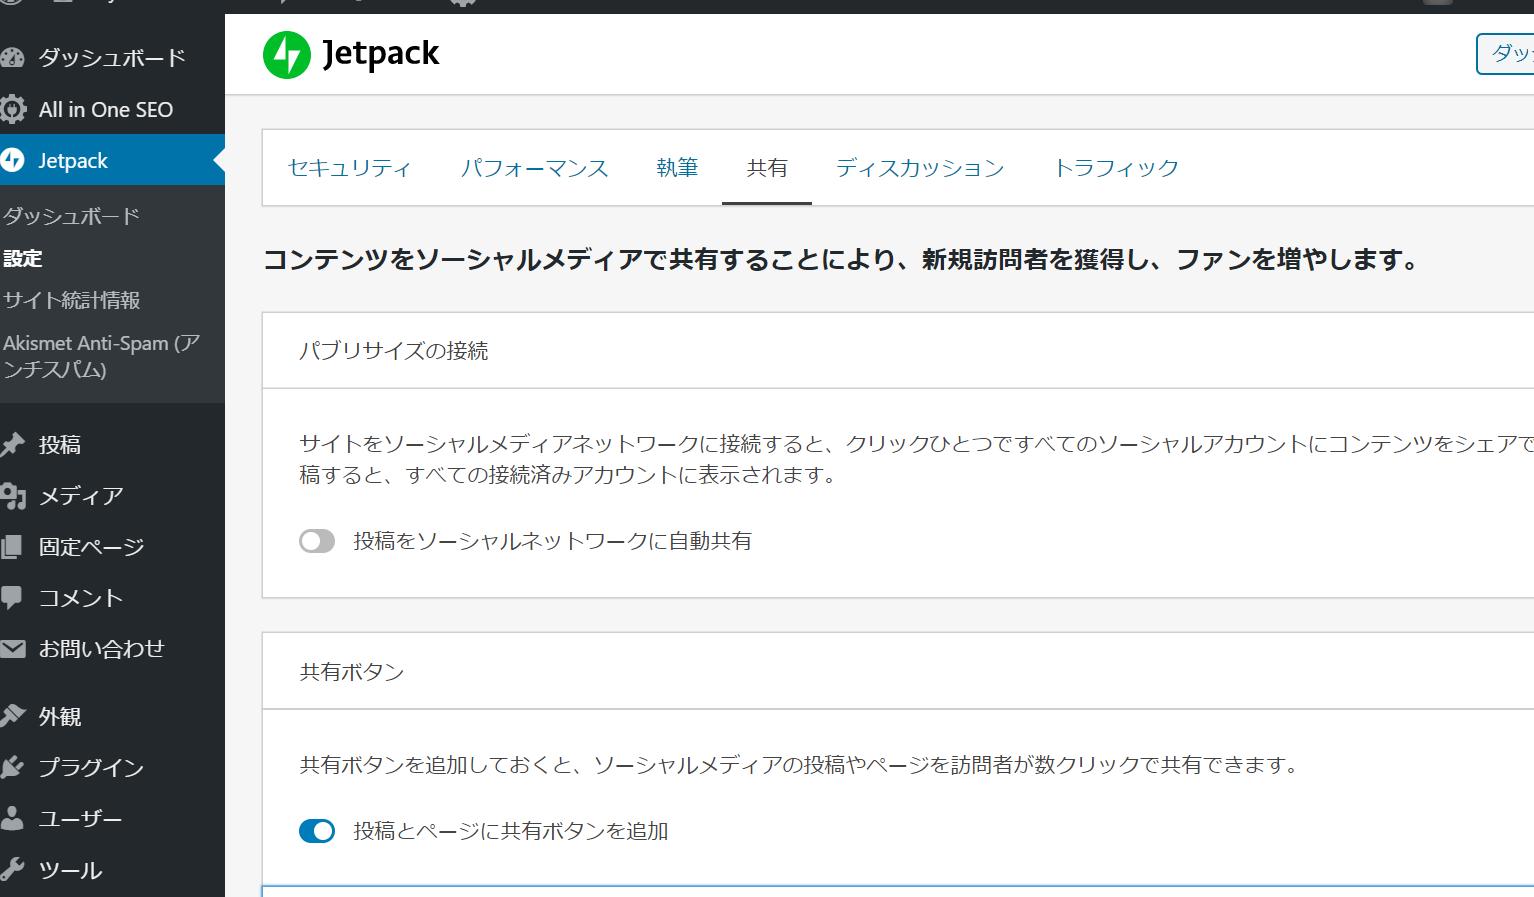 WordPressのJetPackでソーシャル連携を説明している画像